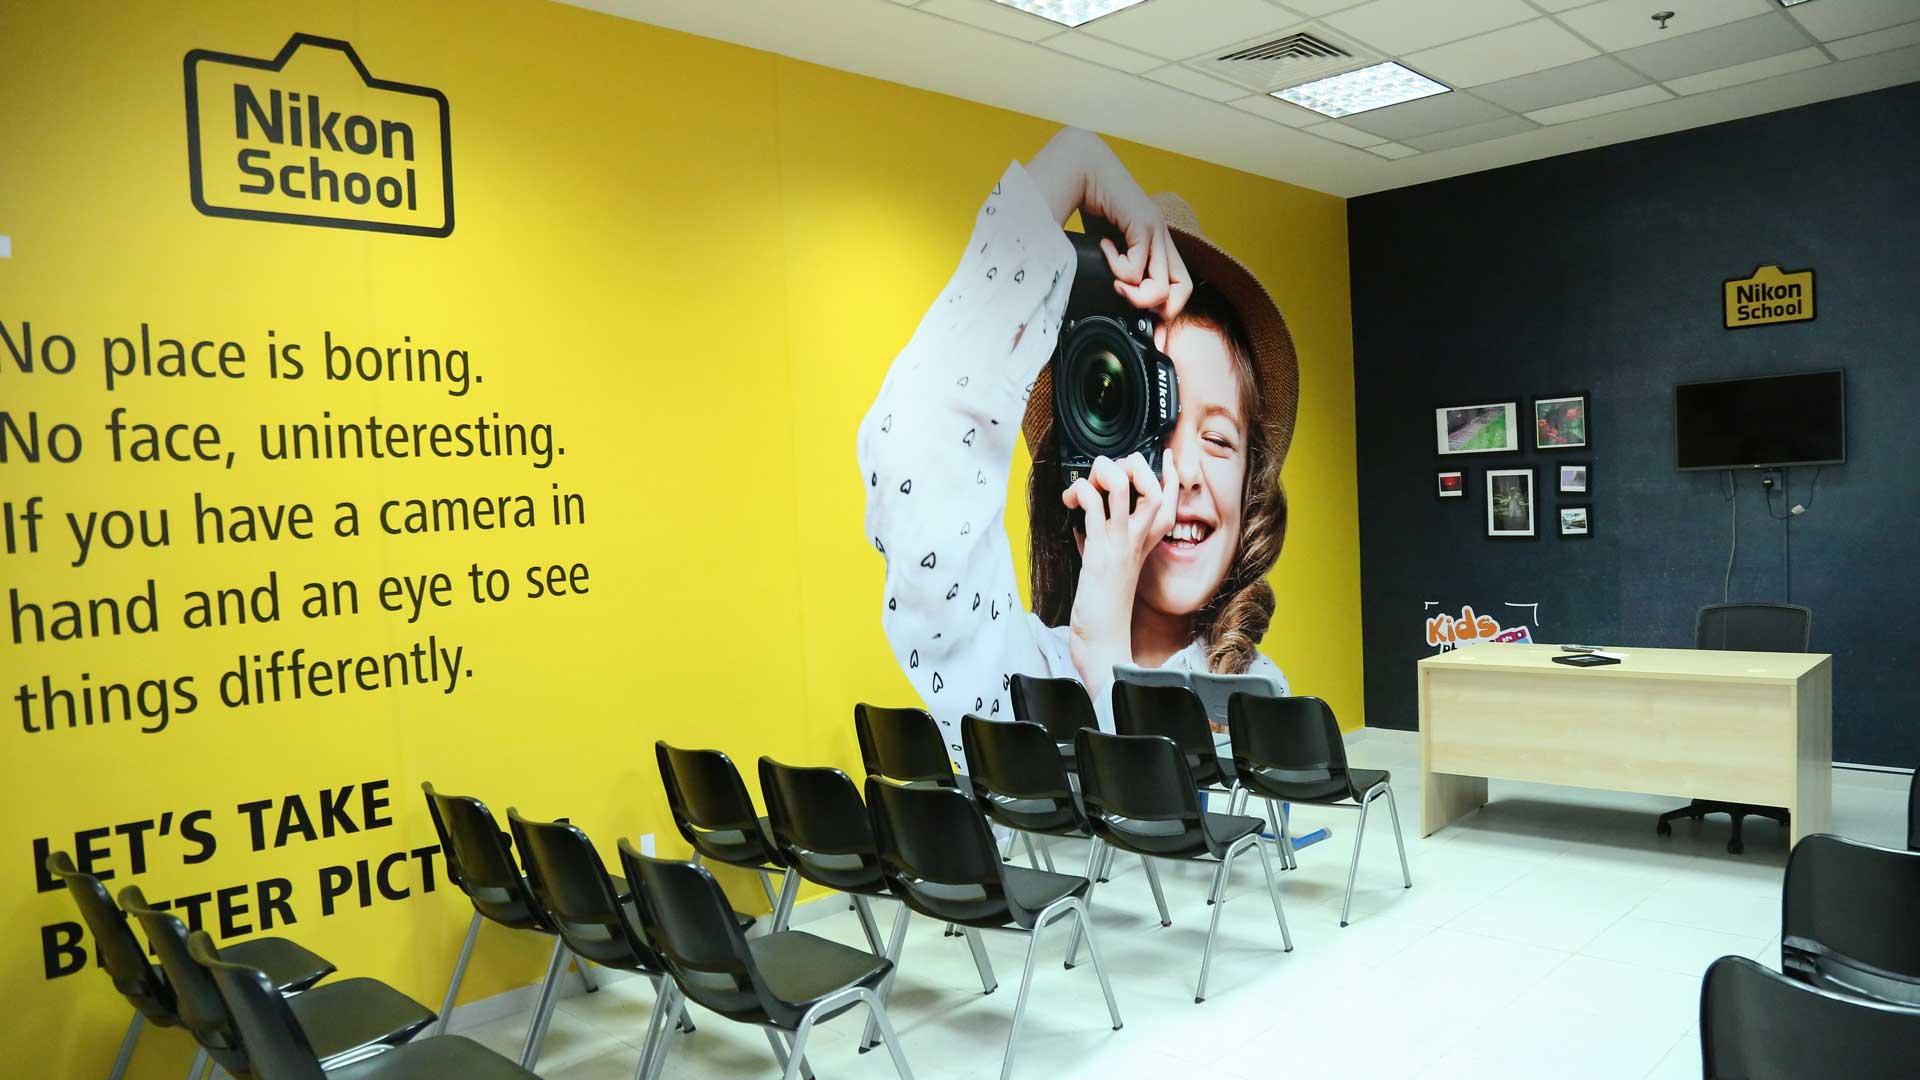 NIkon Photography Club - GIIS Dubai